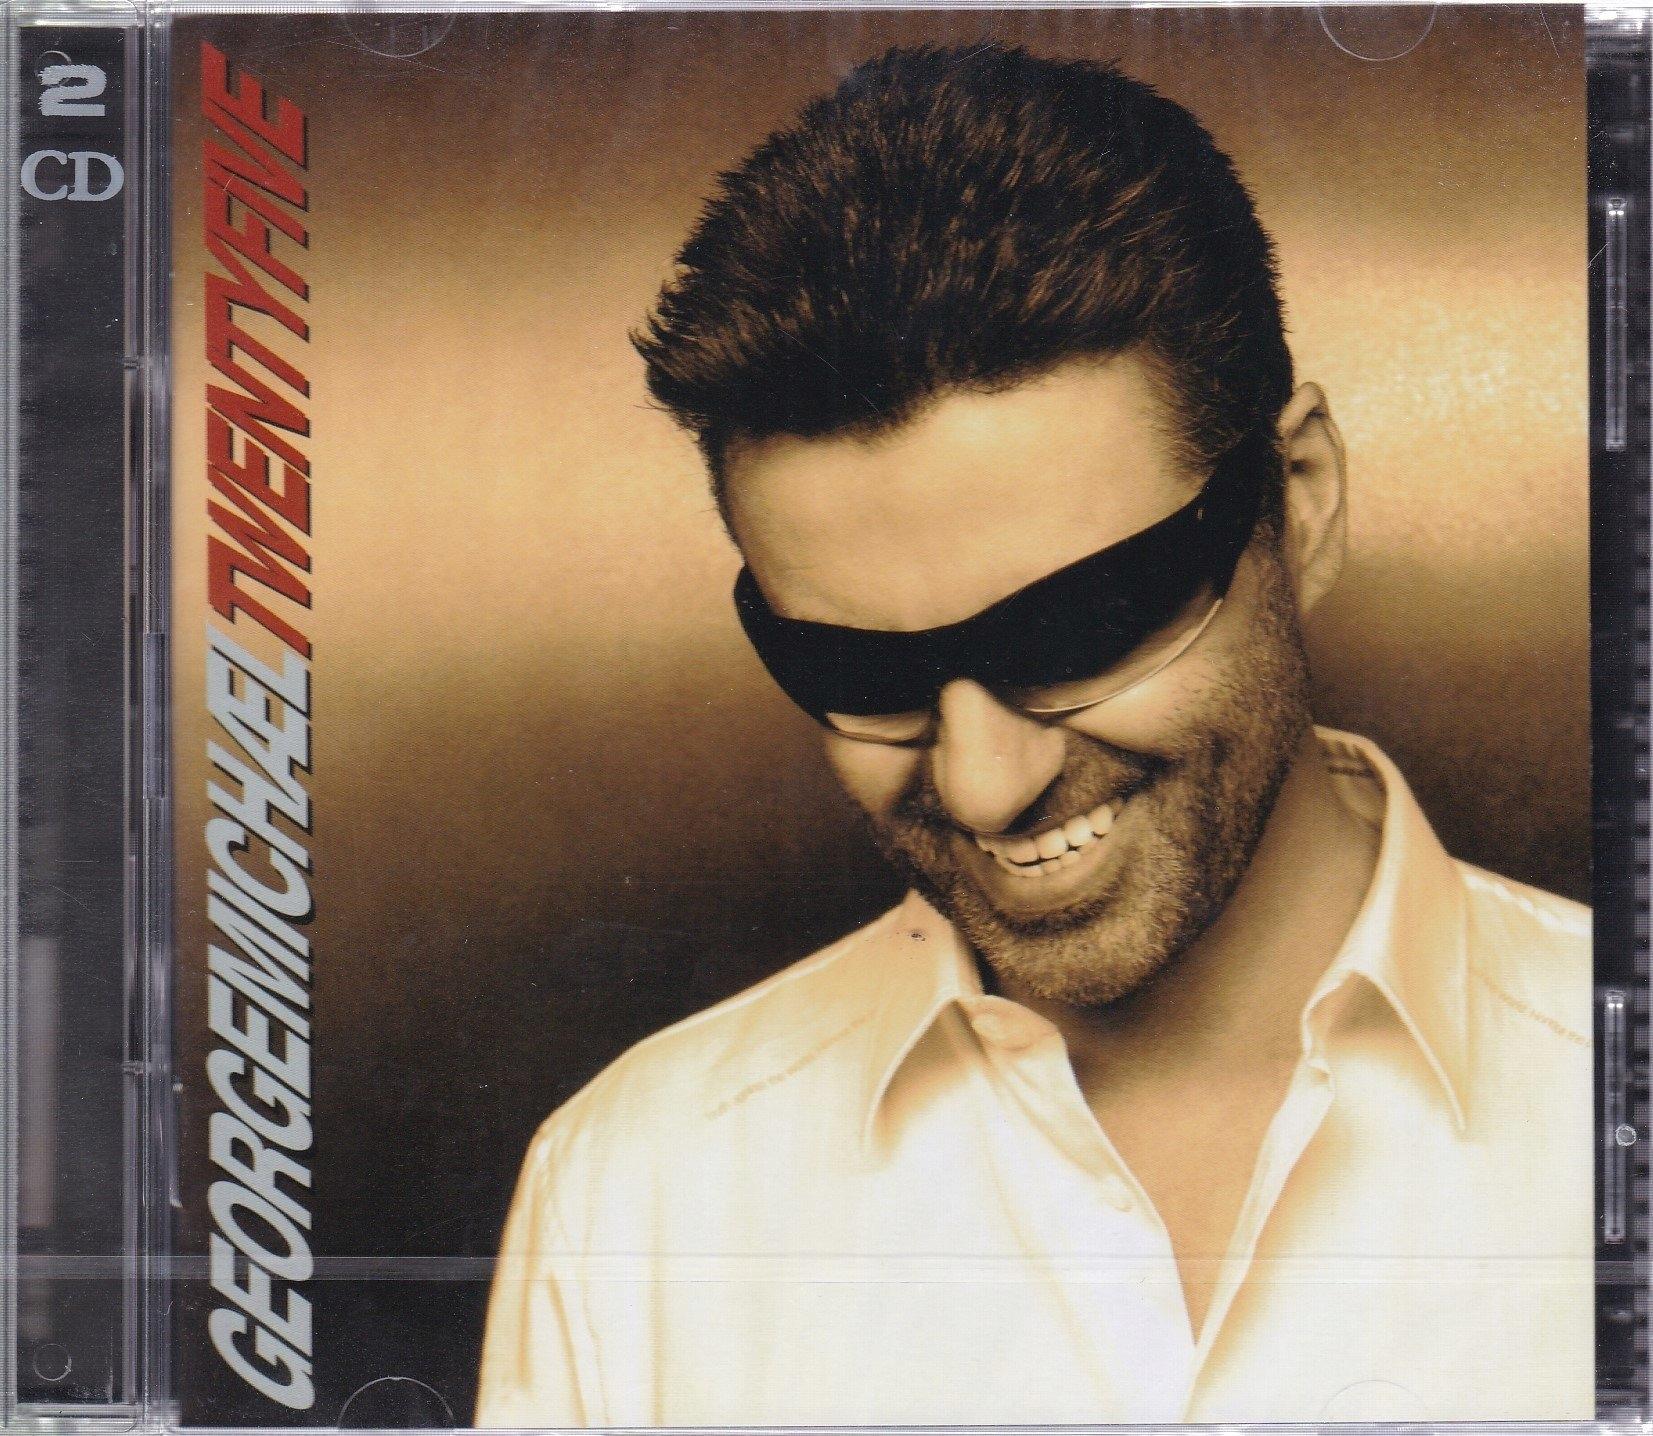 2 CD- GEORGE MICHAEL- TWENTYFIVE: BEST OF (FOLIA)